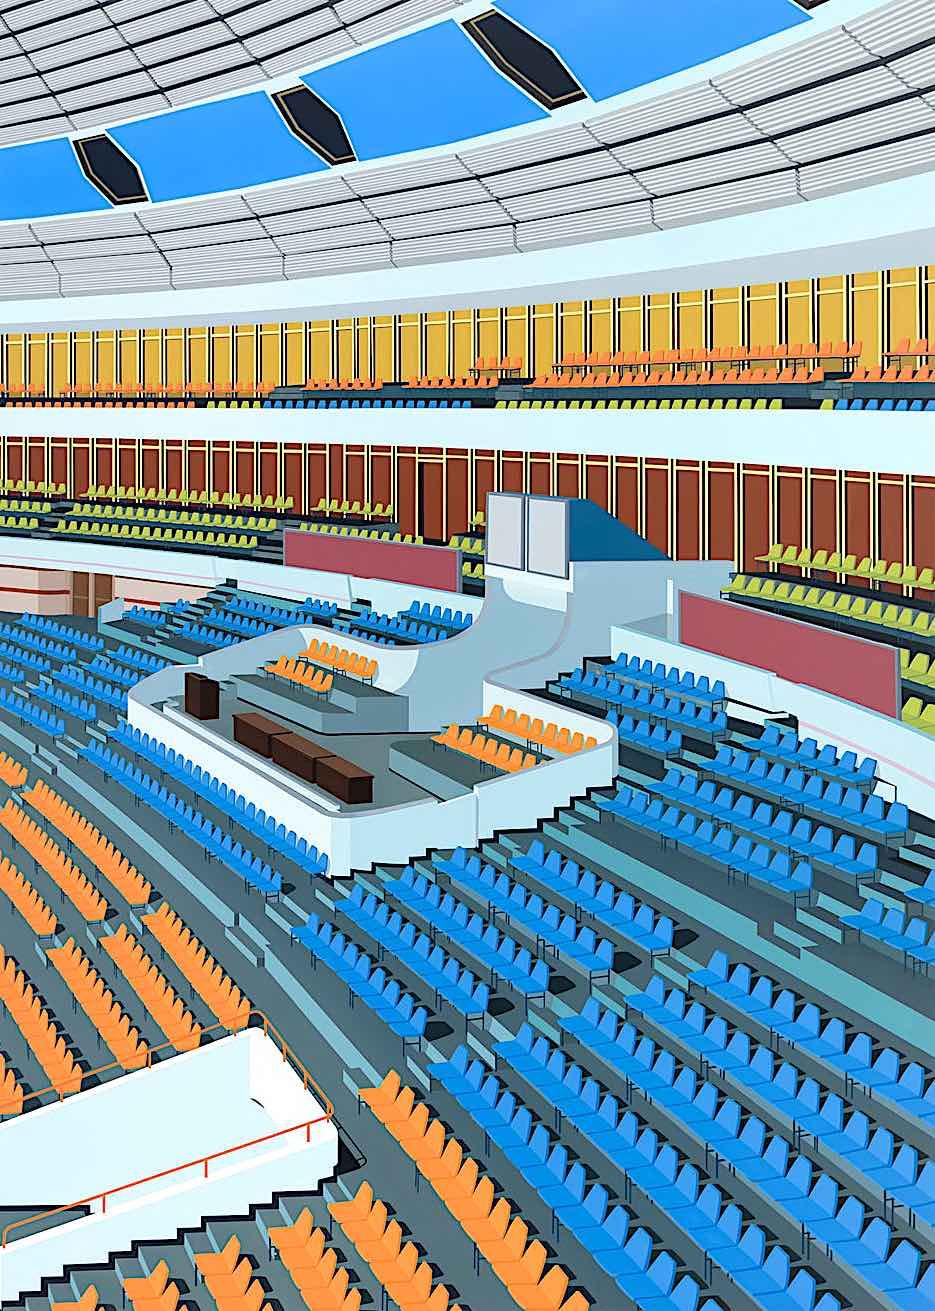 Daniel Rich digital art of a sports stadium in orange and blue